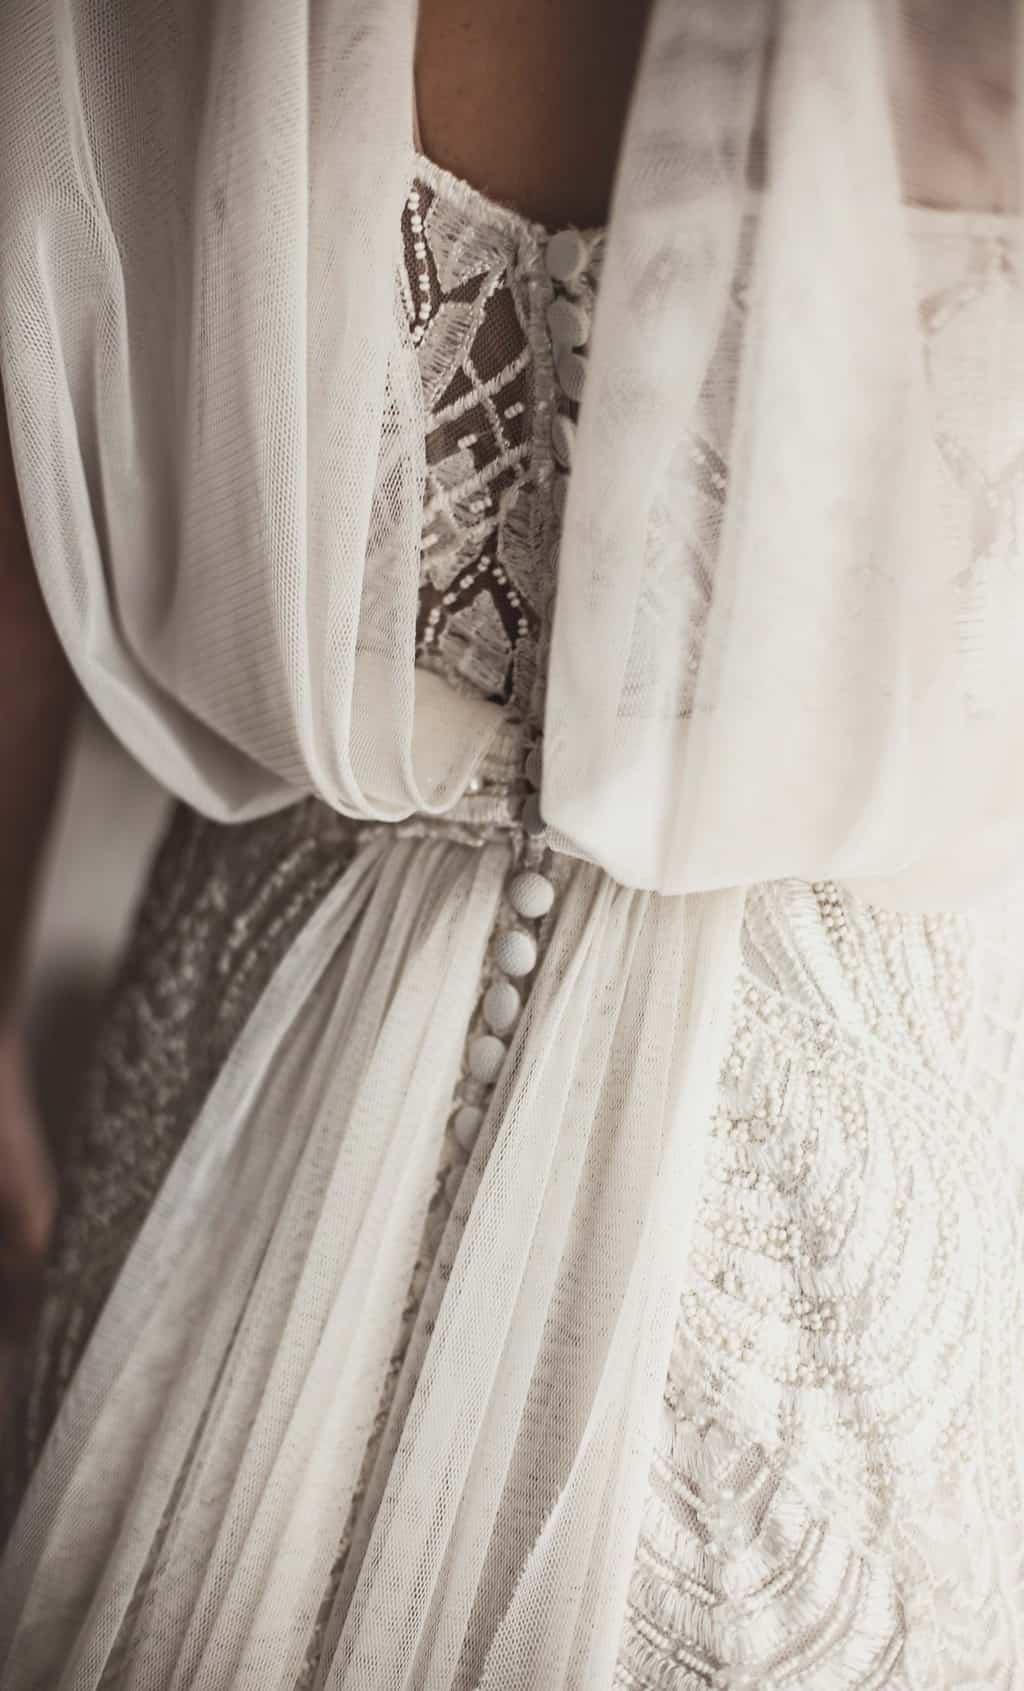 casamento-Ana-Cecilia-e-Leonardo-casamento-na-serra-graviola-filmes-graviolafilmes-laura-camapnella-de-siervi-lauracampanella-studio-laura-camapnella13